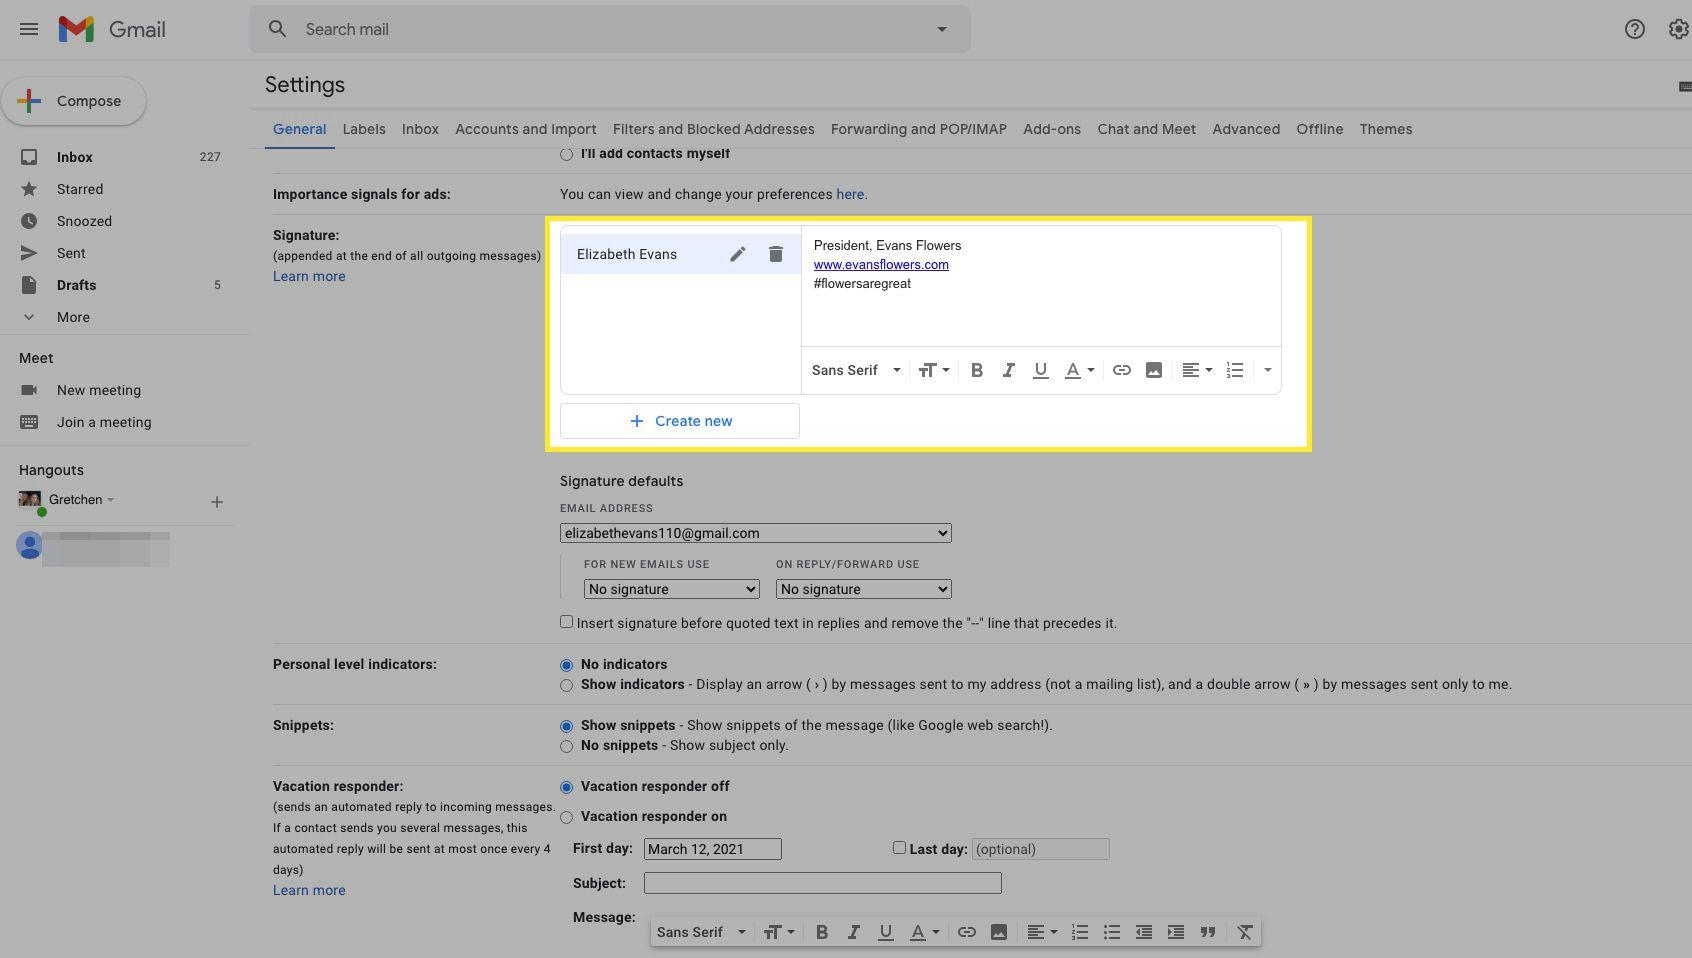 Gmail signature box highlighted